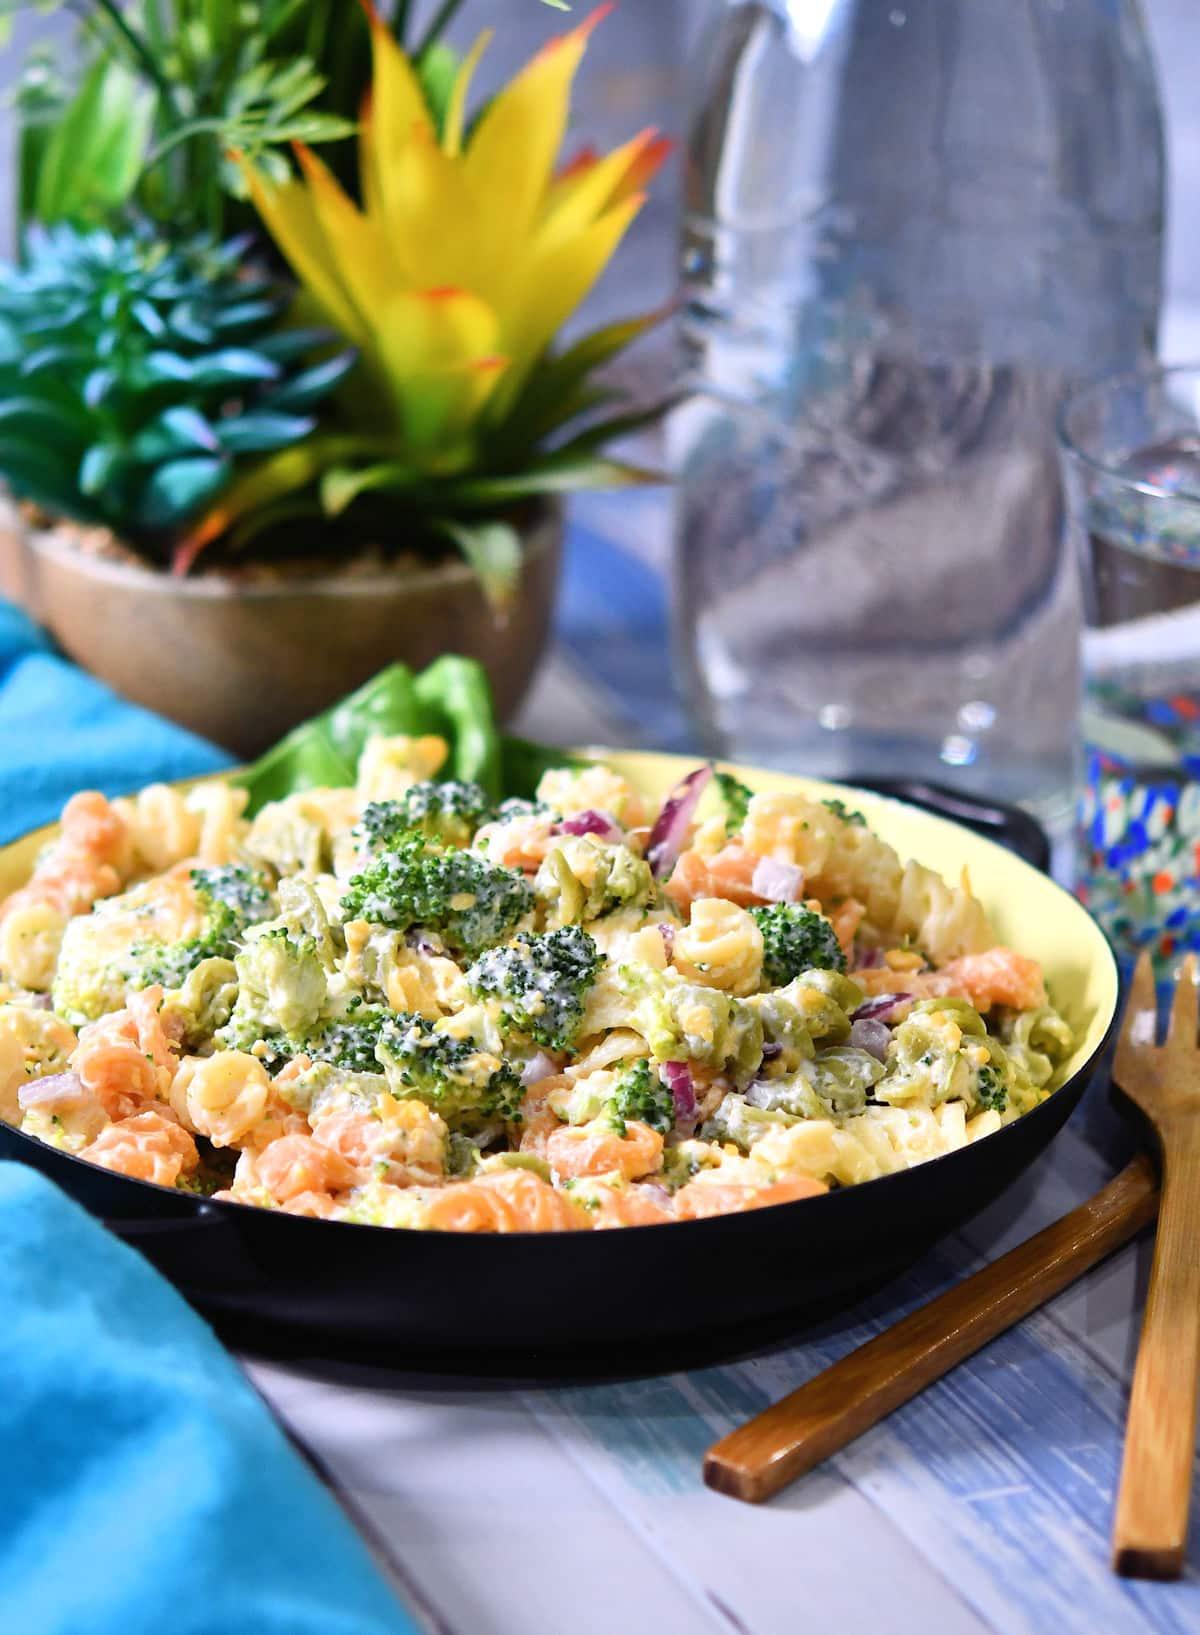 24Bite: Broccoli Cheddar Pasta Salad Recipe by Christian Guzman